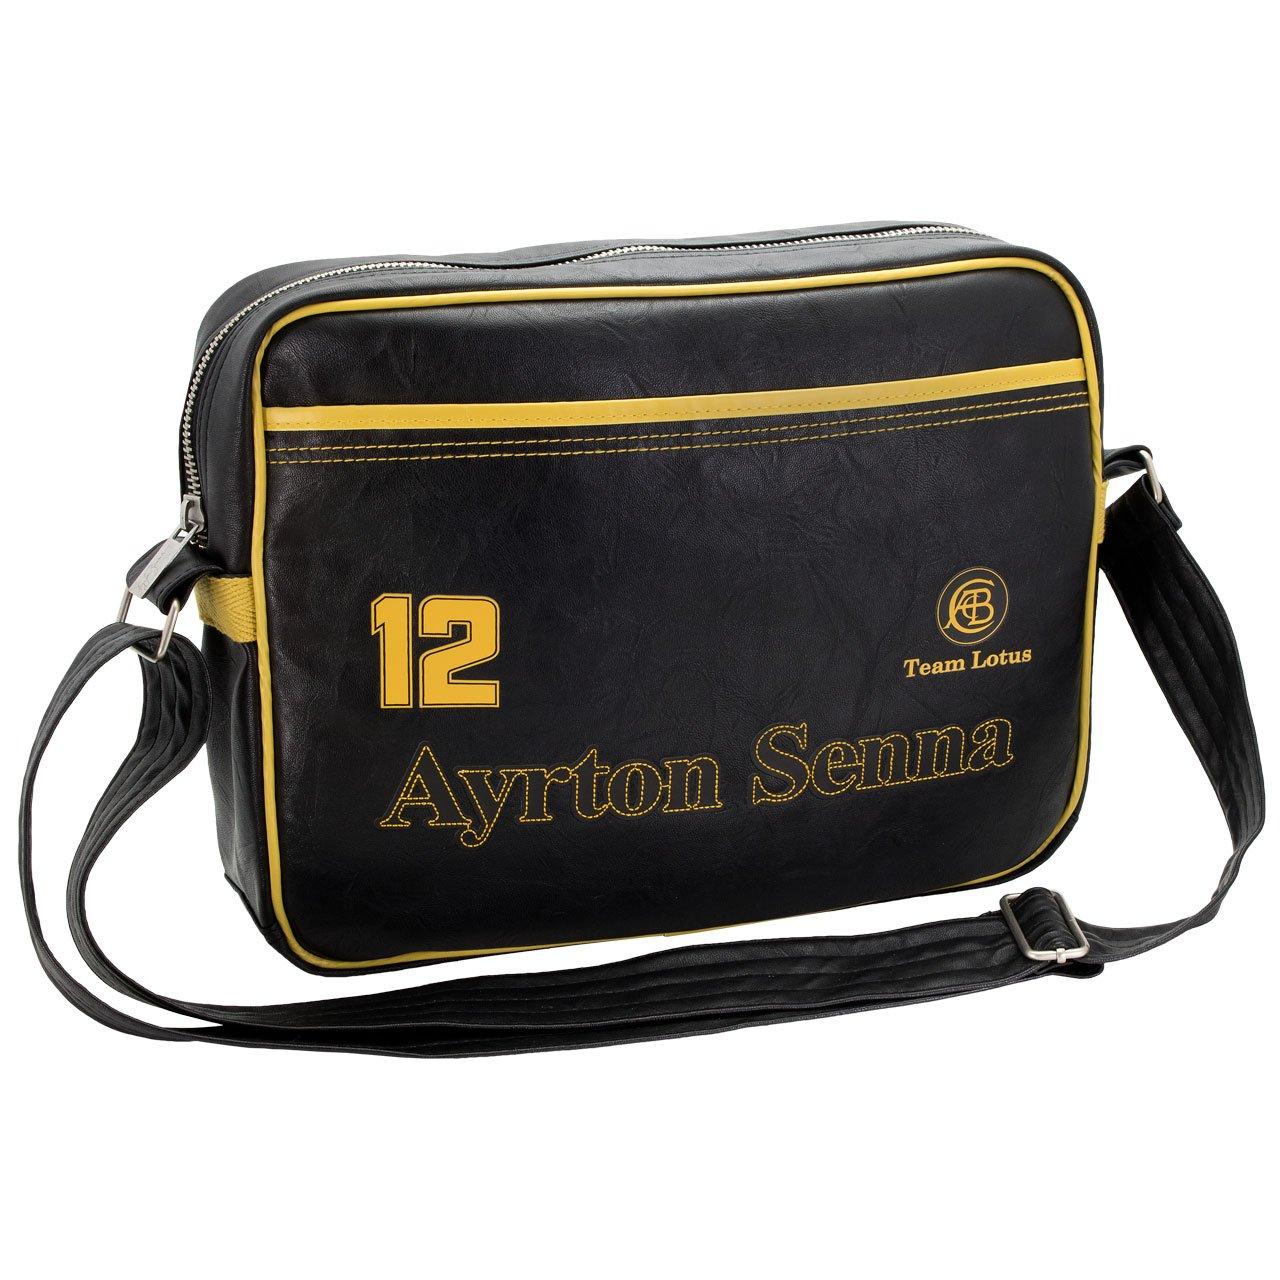 Ayrton Senna Campus Bag Classic Team Lotus MBA-Sport AS-15-859